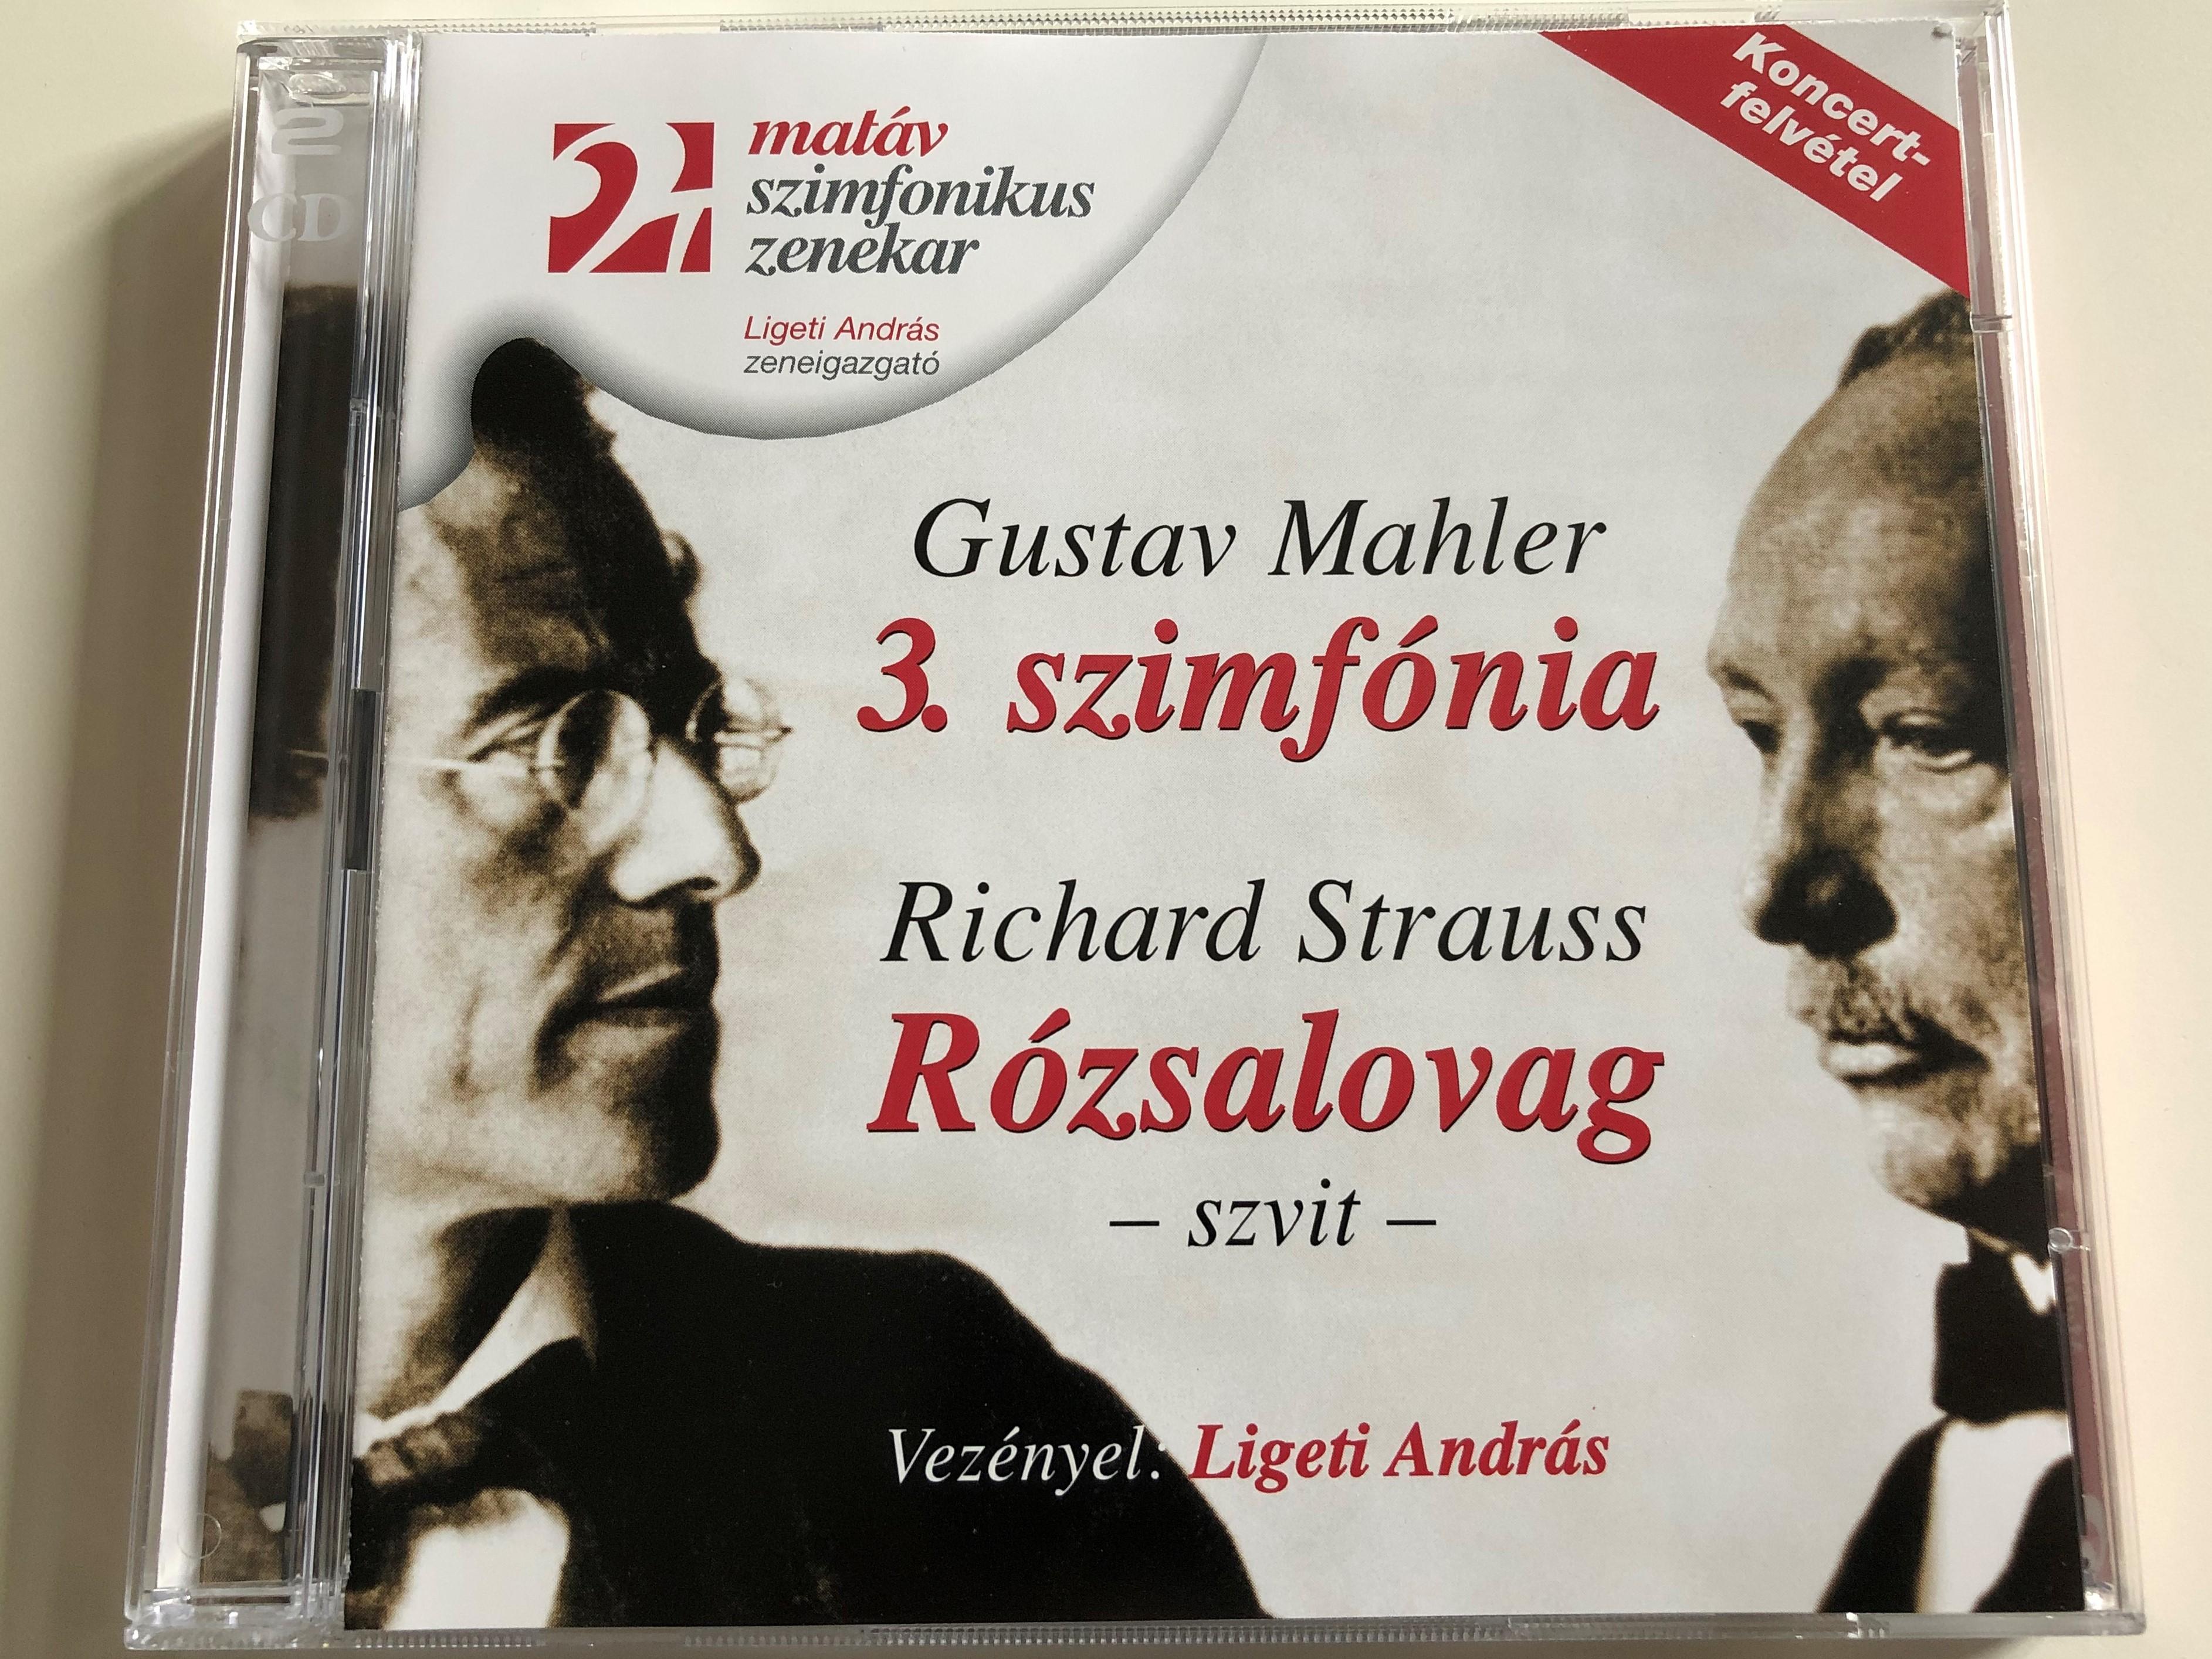 gustav-mahler-3.-szimf-nia-richard-strauss-r-zsalovag-szvit-mat-v-szimfonikus-zenekar-mat-v-symphonic-orchestra-hungary-conducted-by-ligeti-andr-s-concert-recording-double-cd-mhso-08-09-1-.jpg